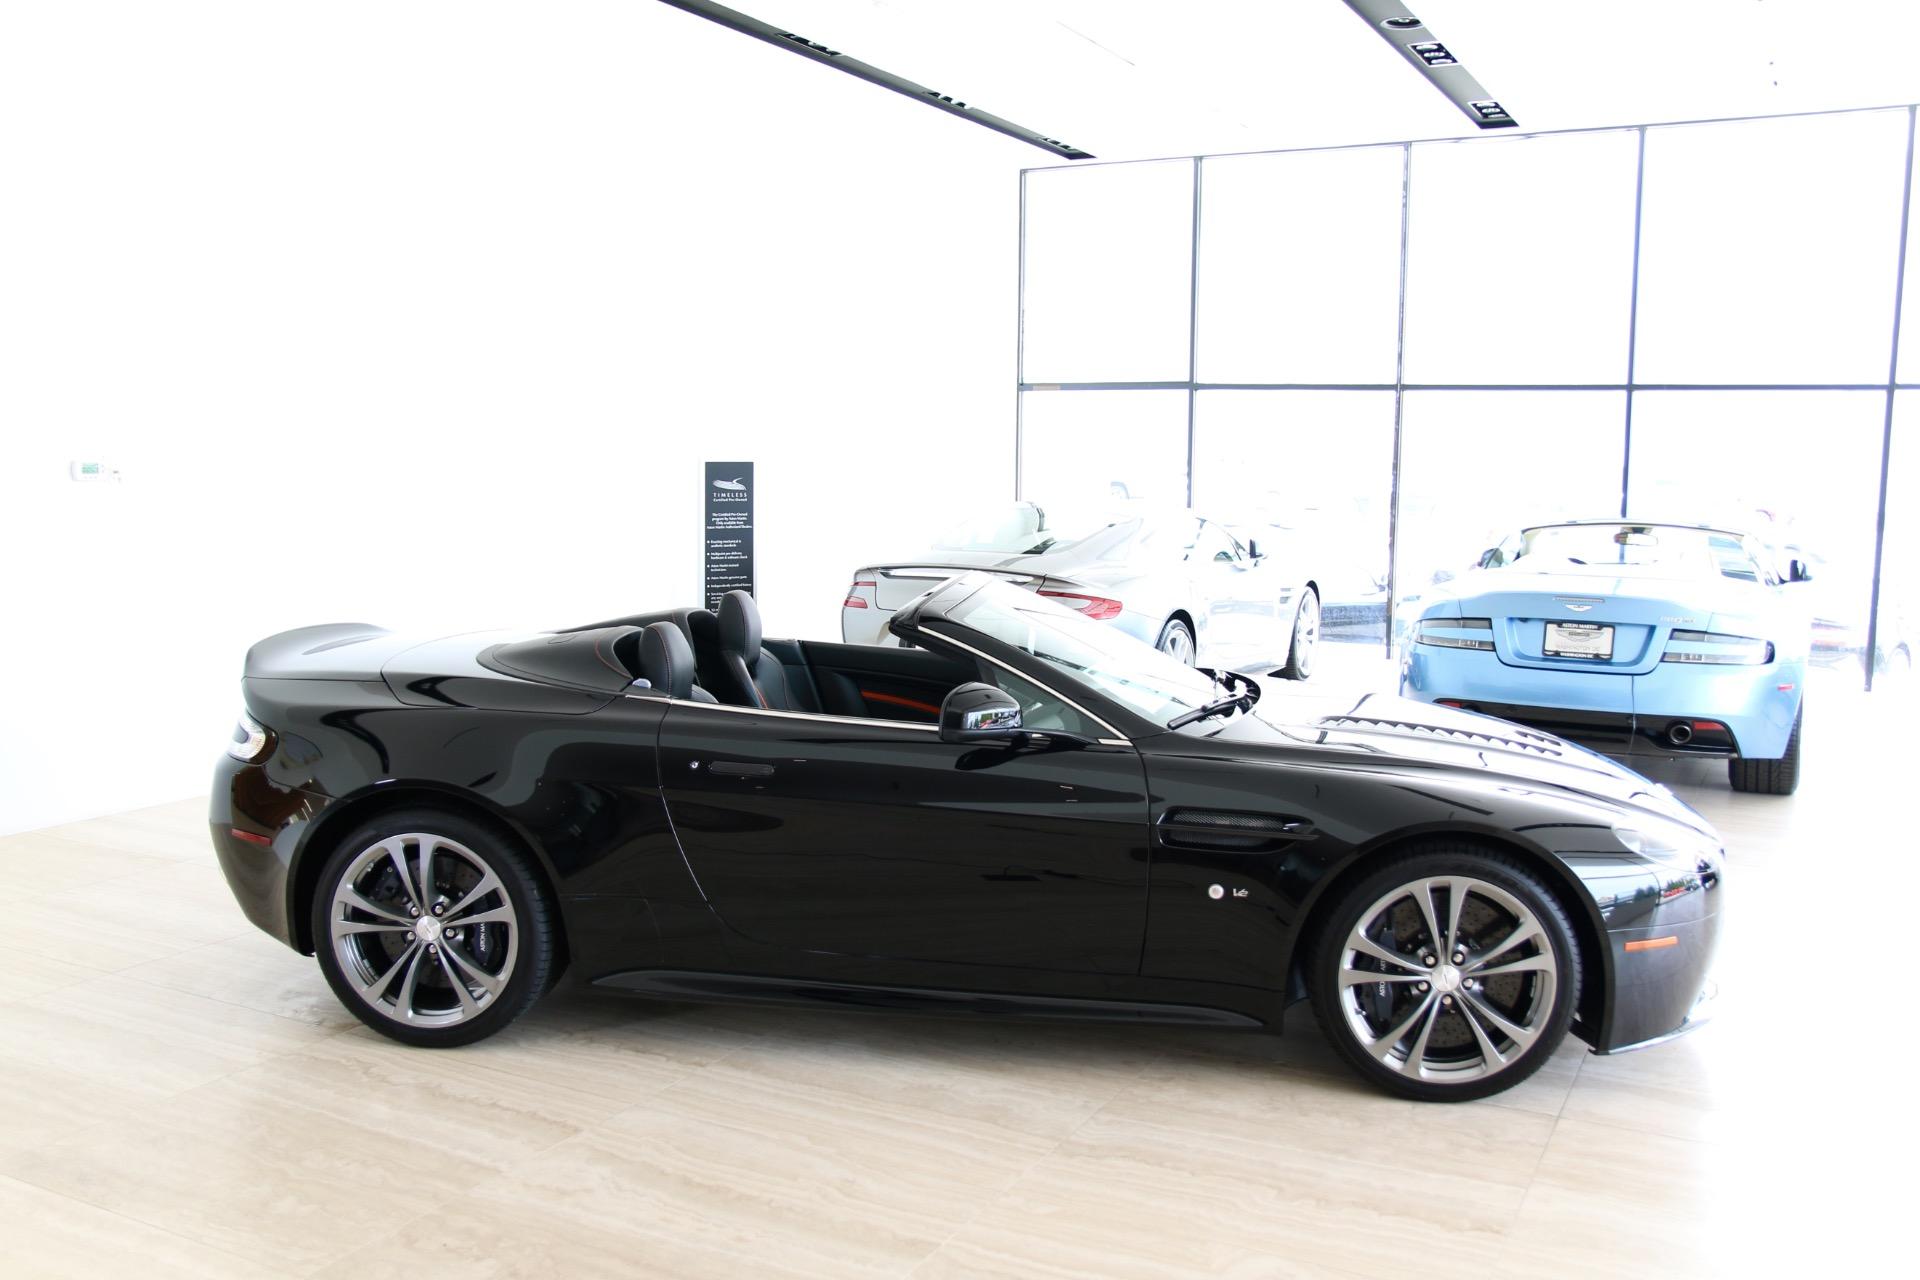 New-2017-Aston-Martin-V12-Vantage-S-Roadster